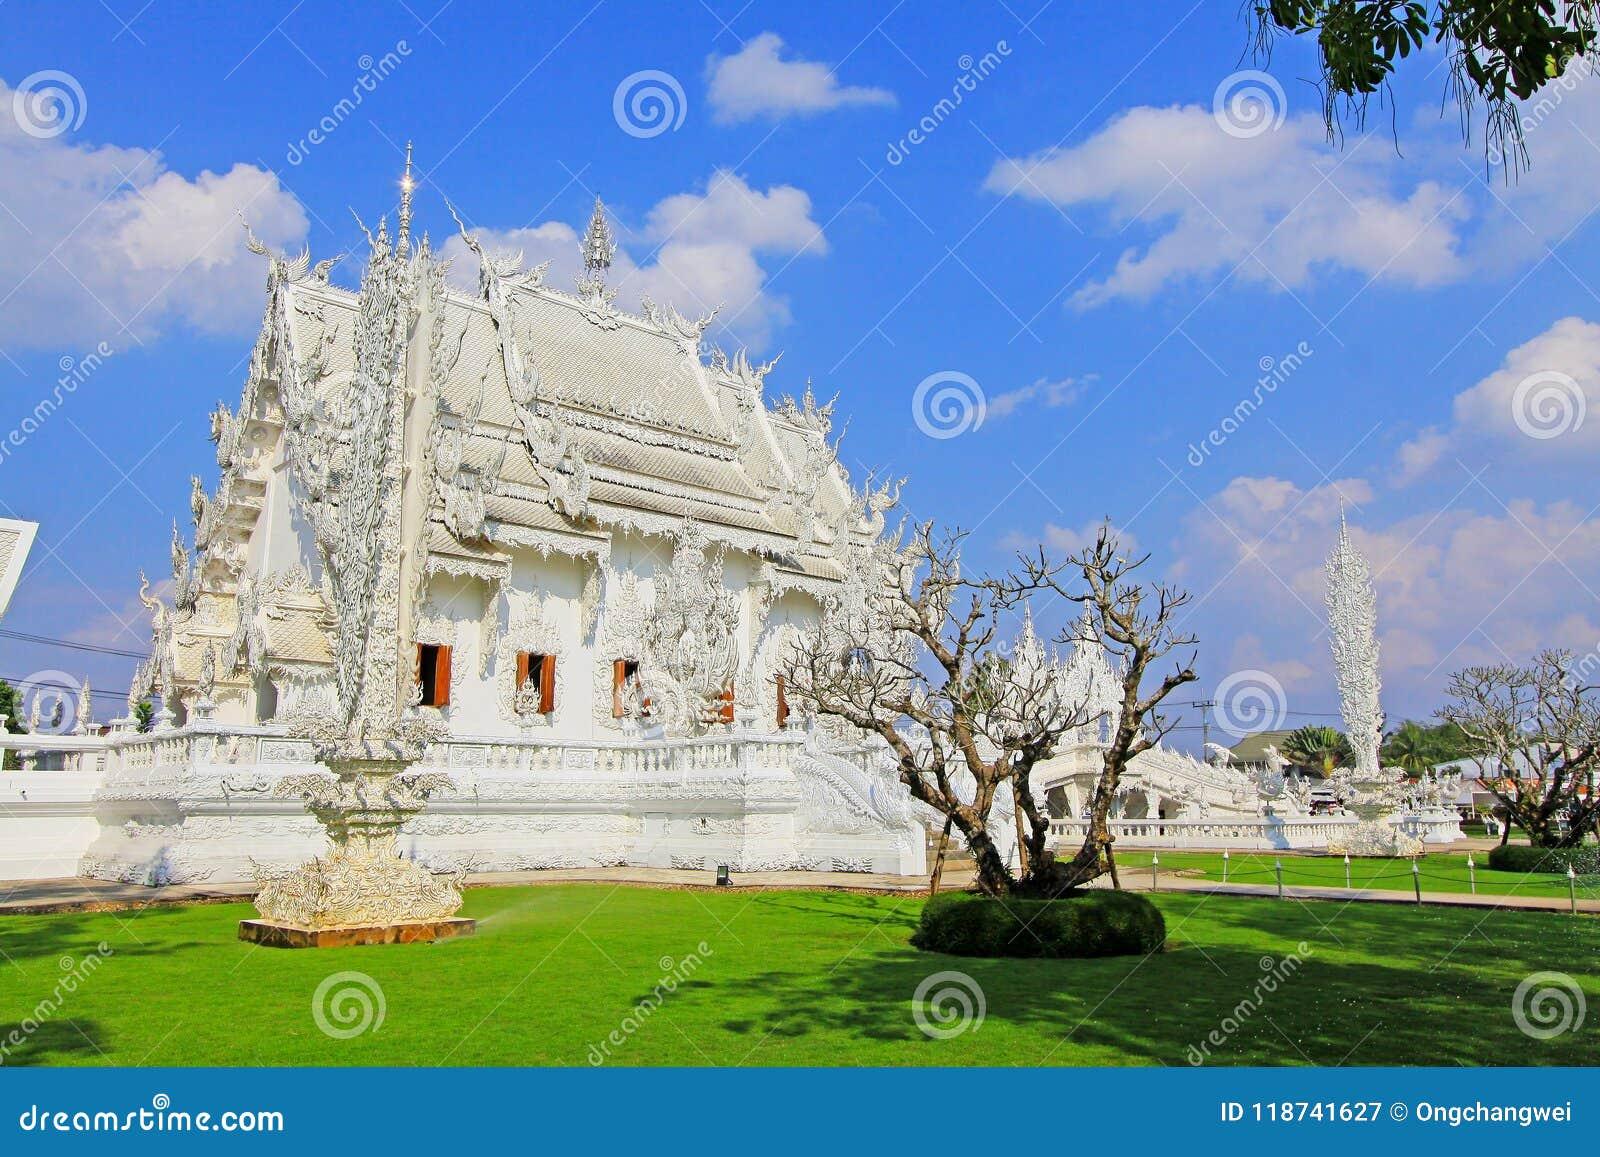 Wat Rong Khun White Temple, Chiang Rai, Thailand